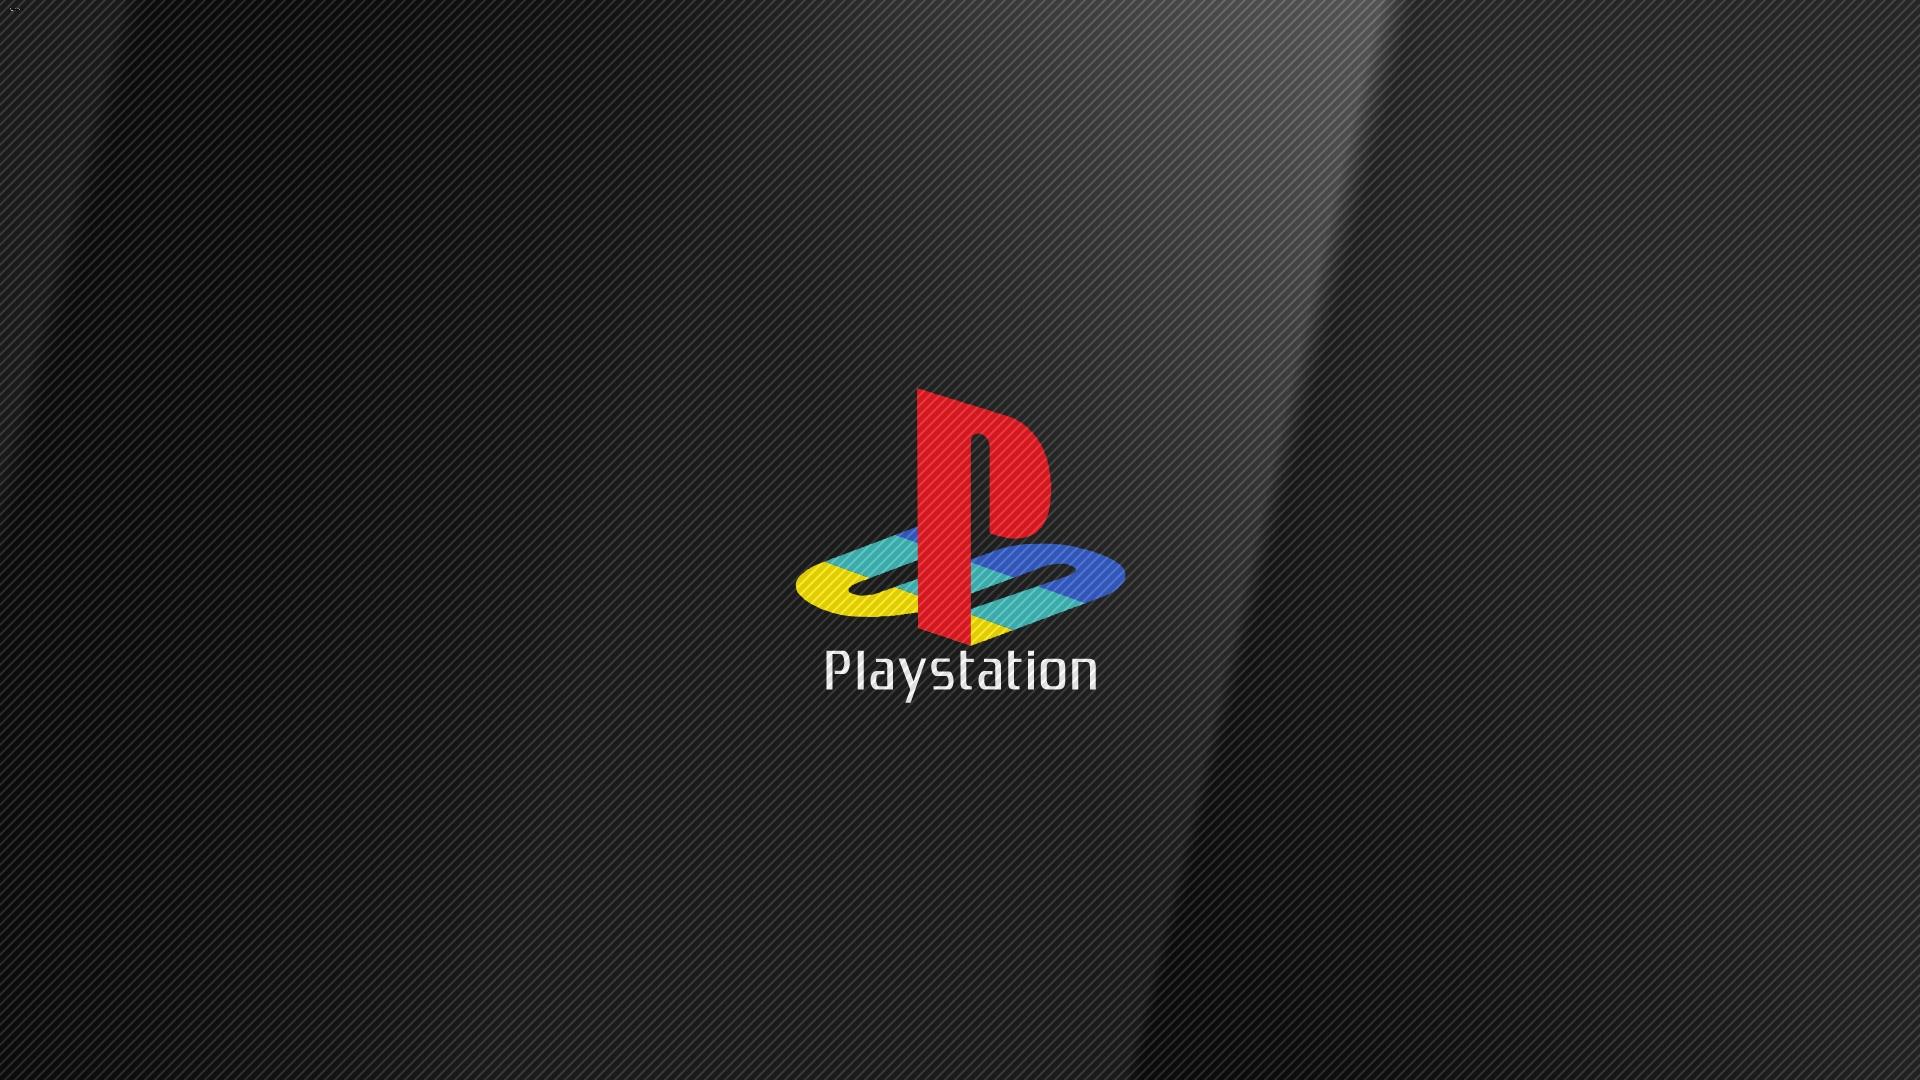 [47+] PS4 Logo Wallpaper on WallpaperSafari